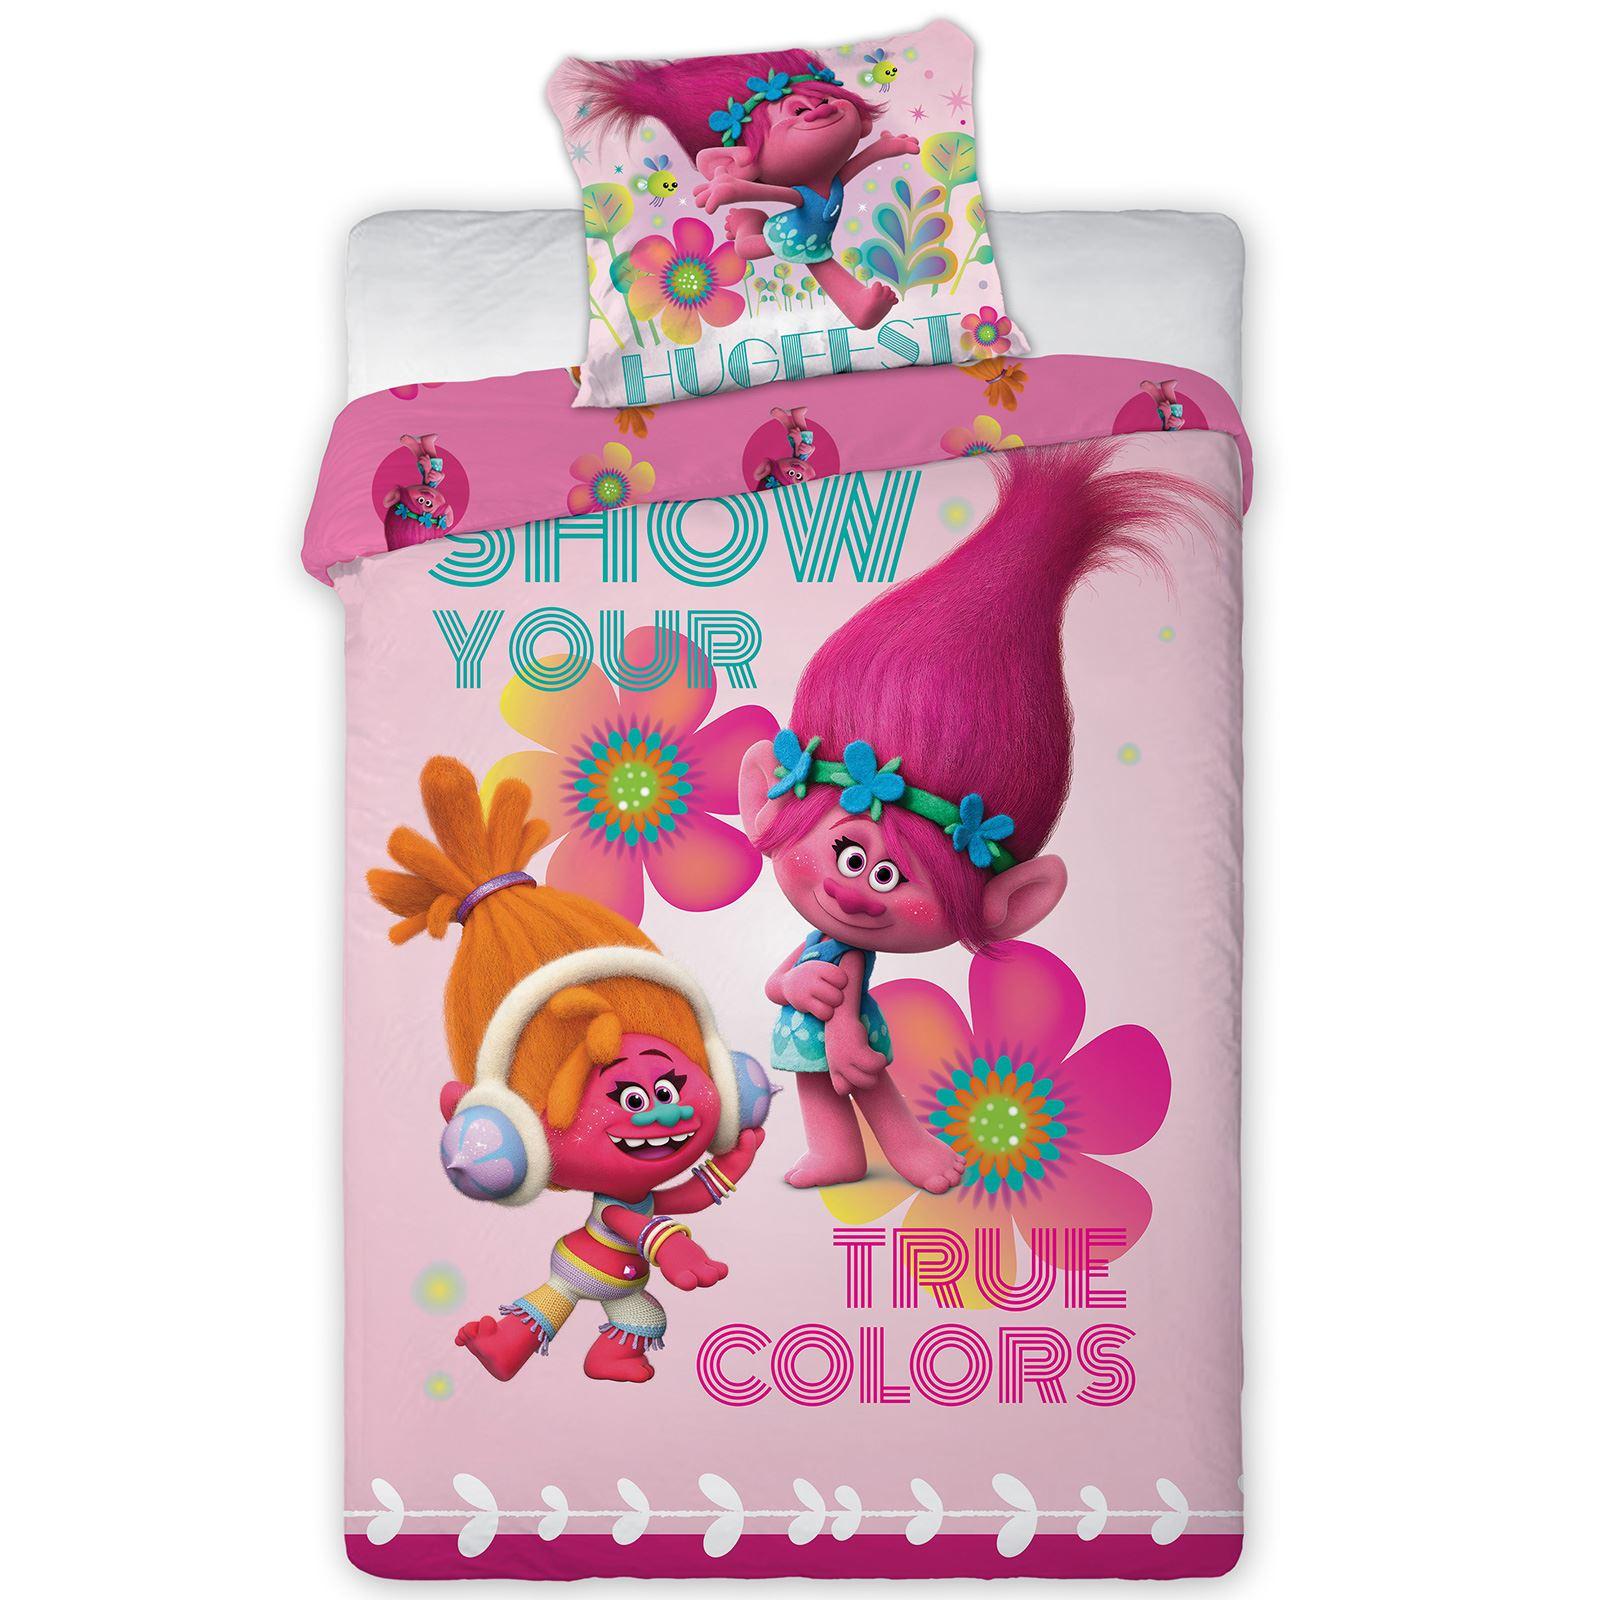 Trolls Duvet Cover And Pillowcase Sets Kids Bedding New